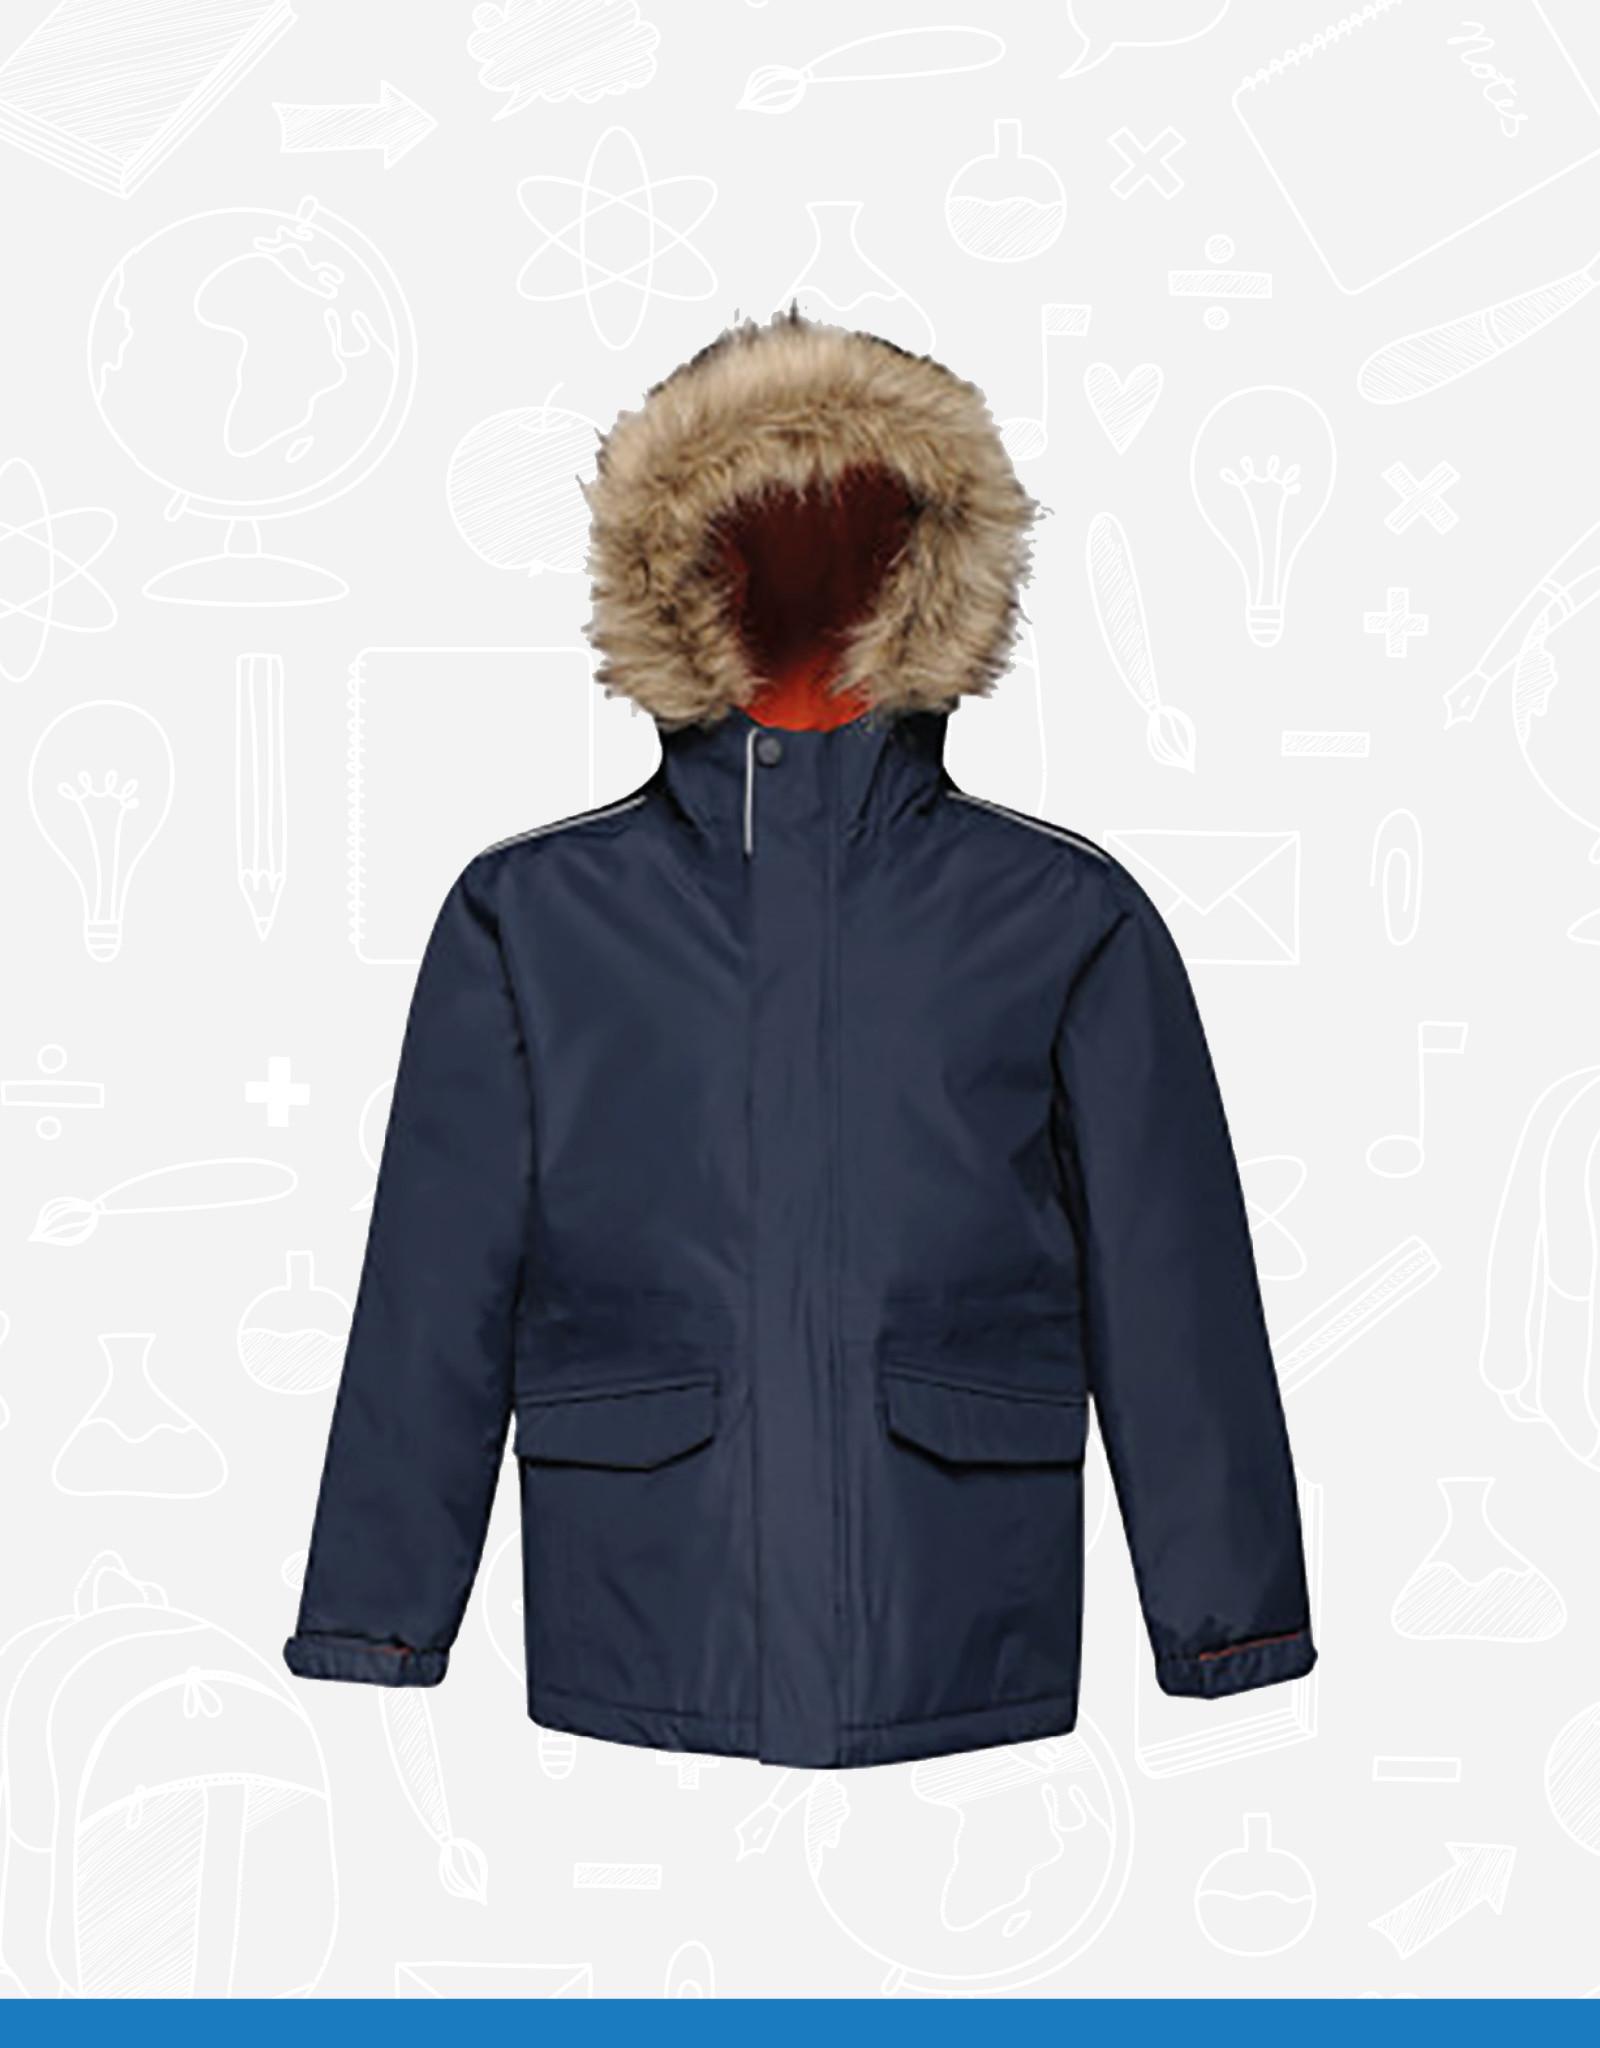 Regatta Insulated Parka Jacket (RG260)